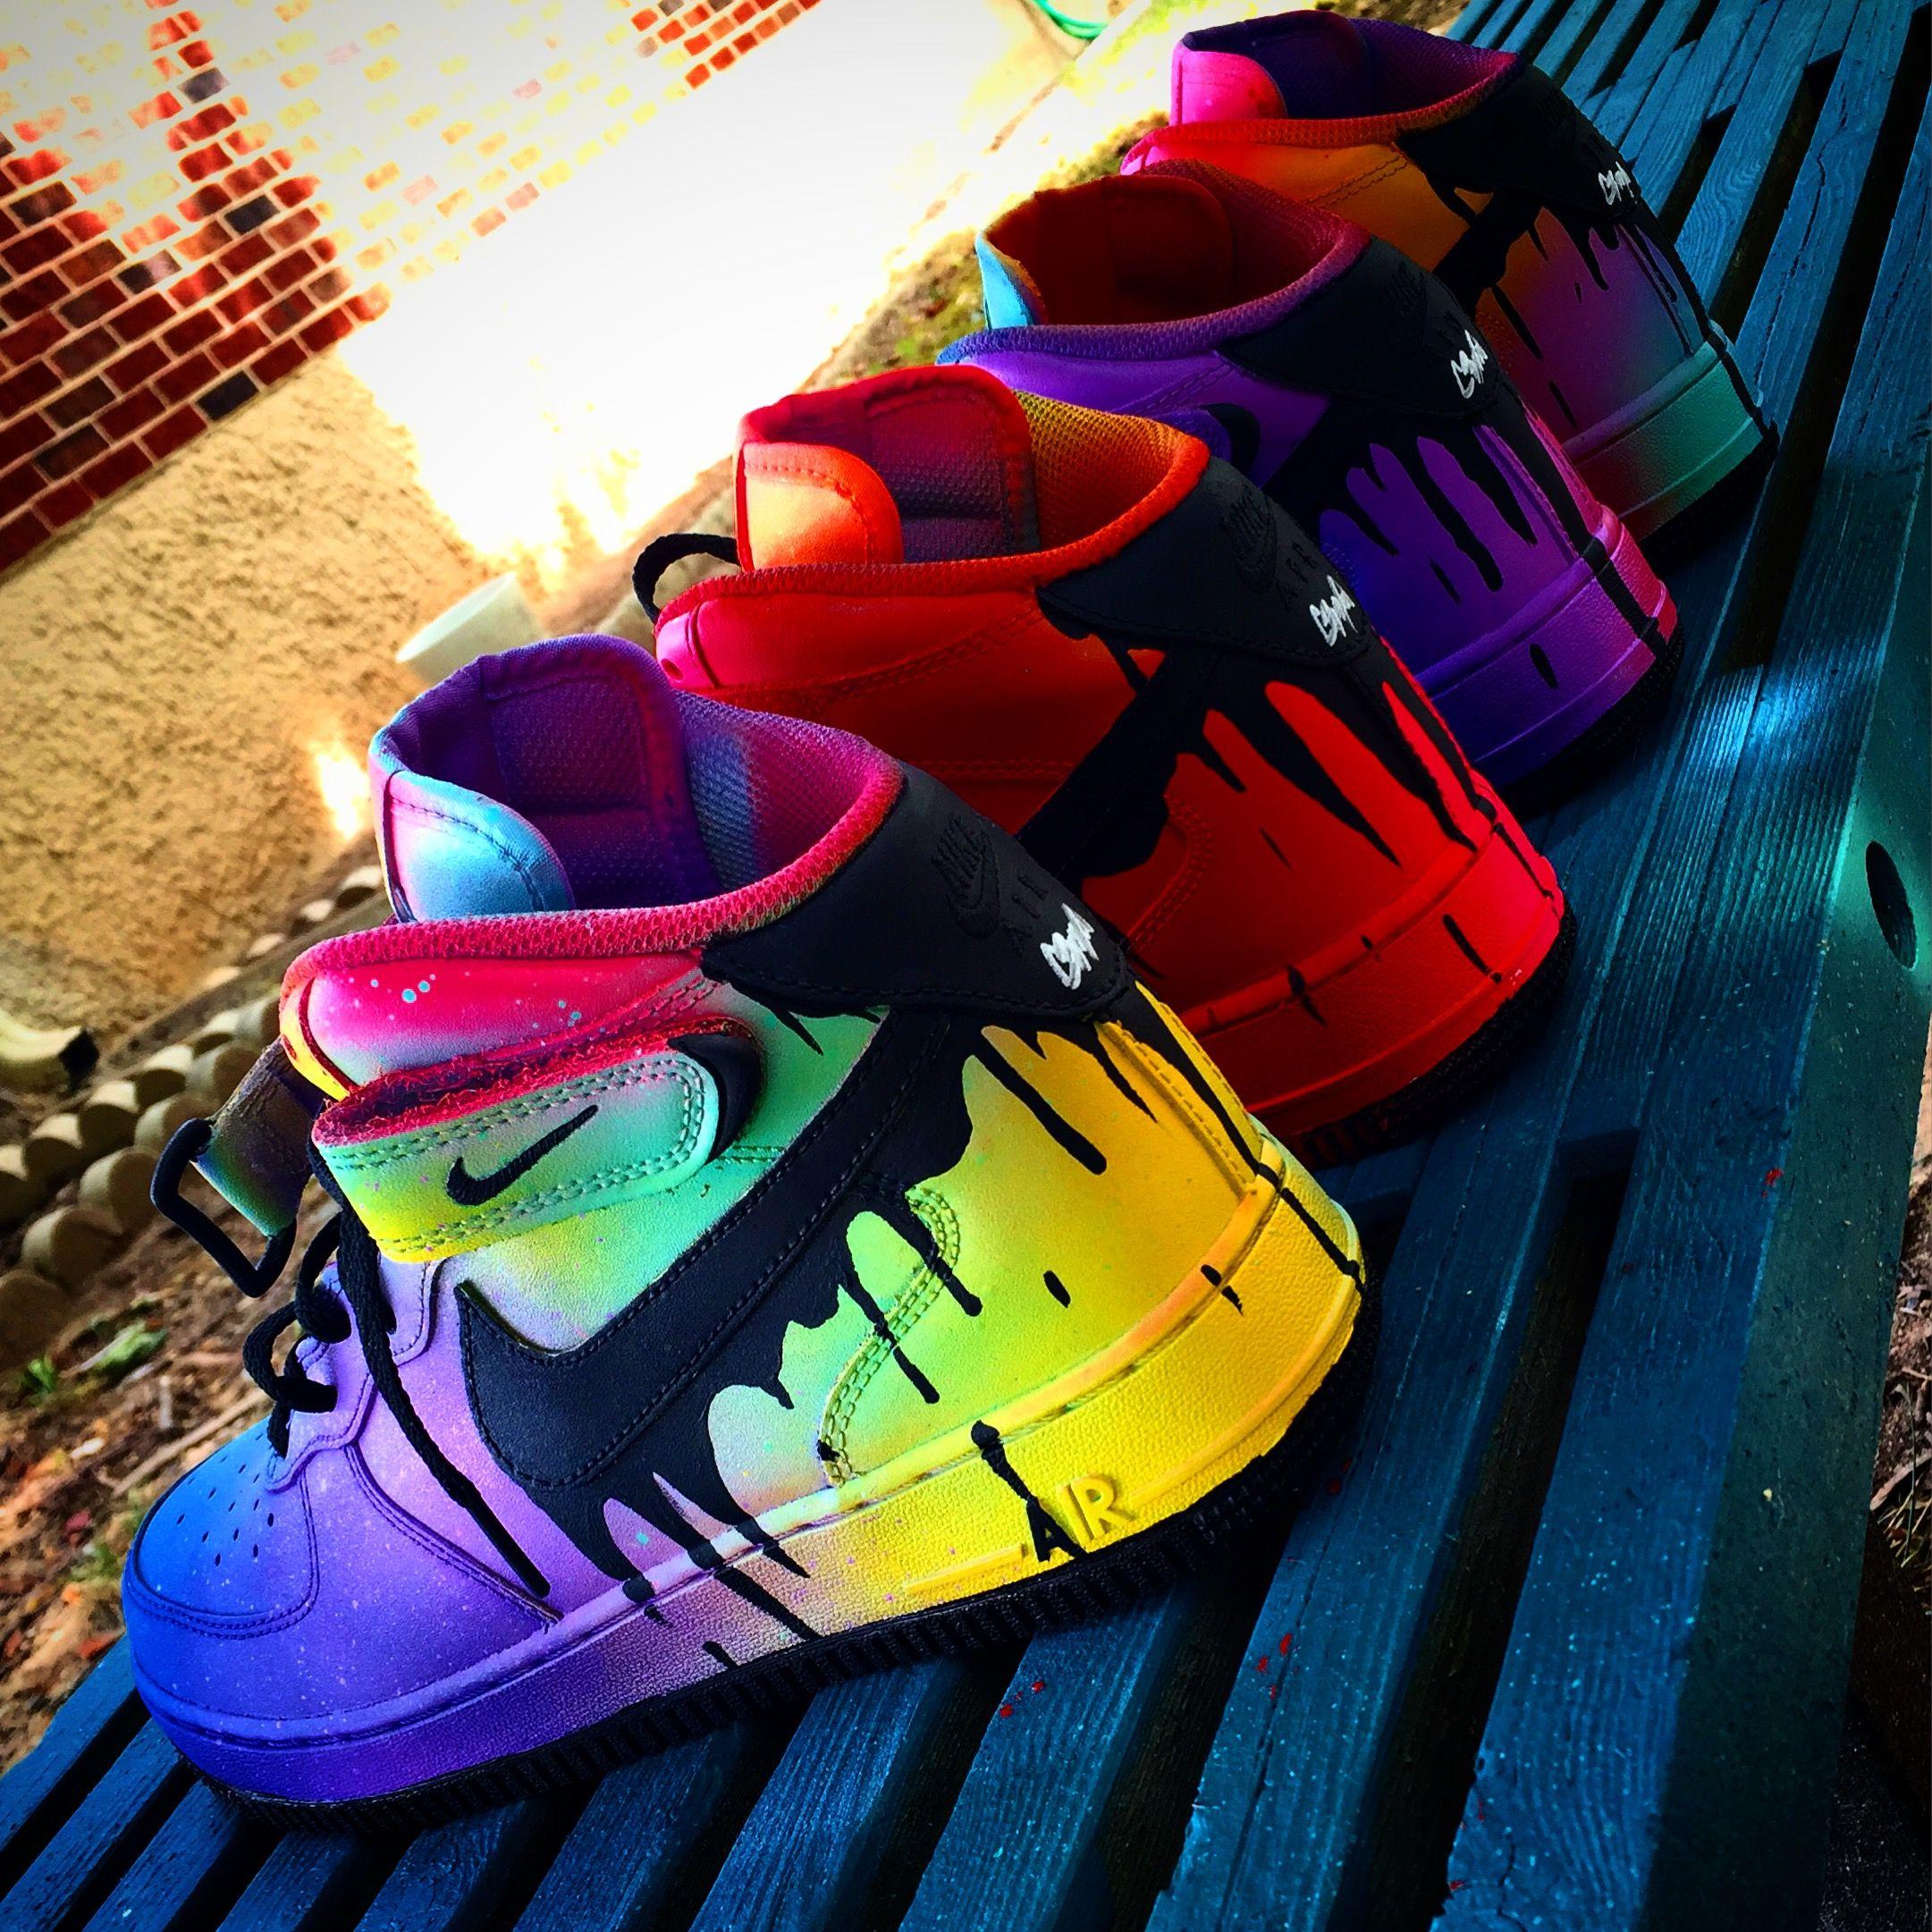 Custom neon Pink Nike Air force 1 Mid Top Trainers